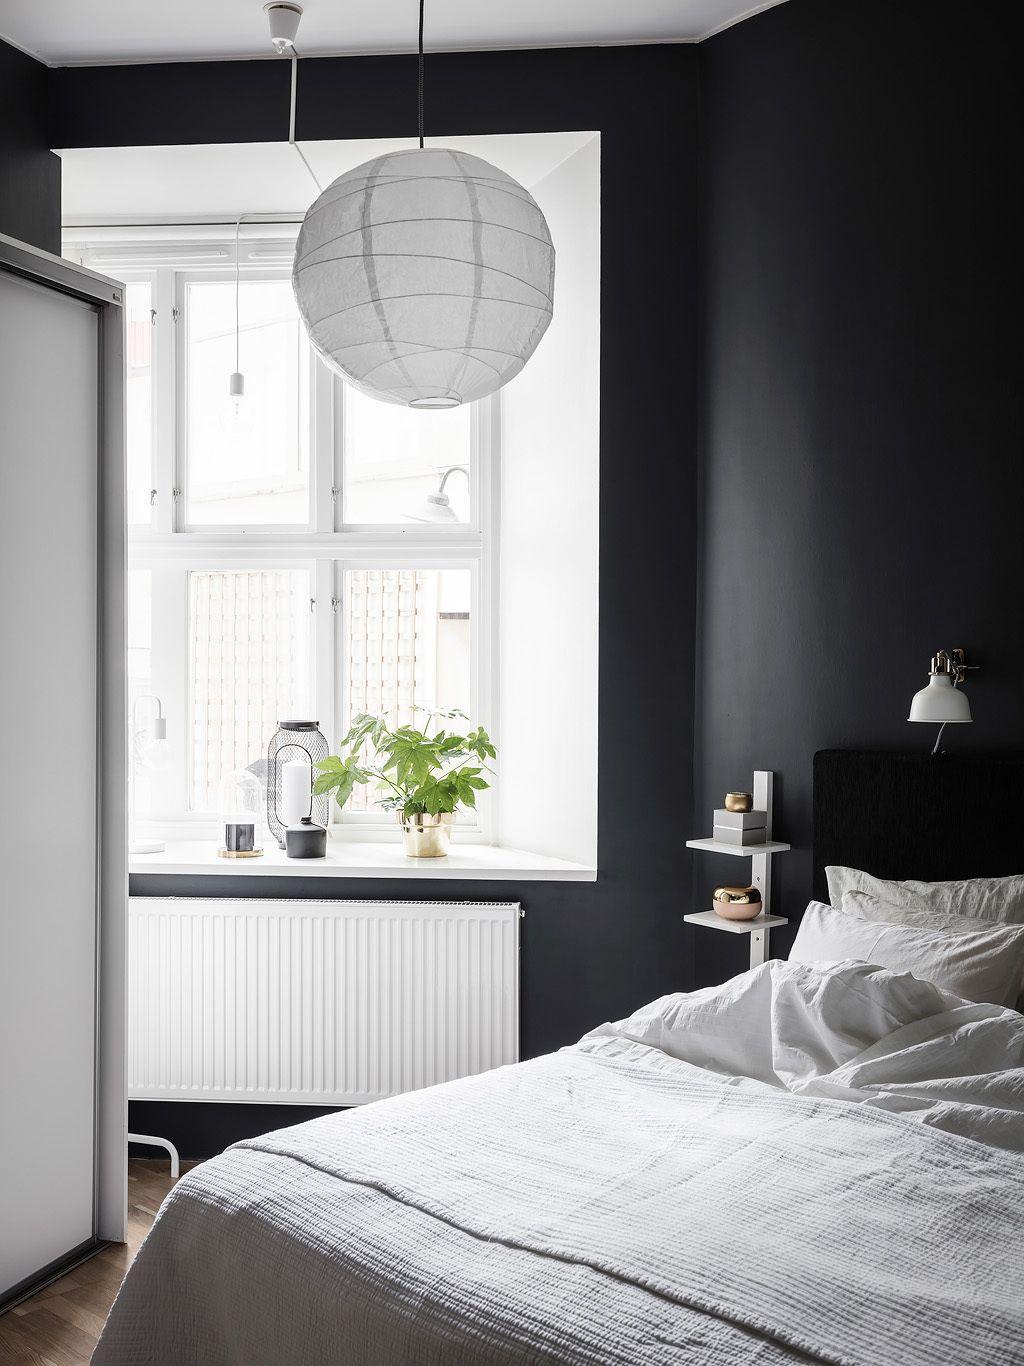 Pere  negri in dormitor intr un apartament de  jurnal design interior warehouse also bedknobs and rh pinterest